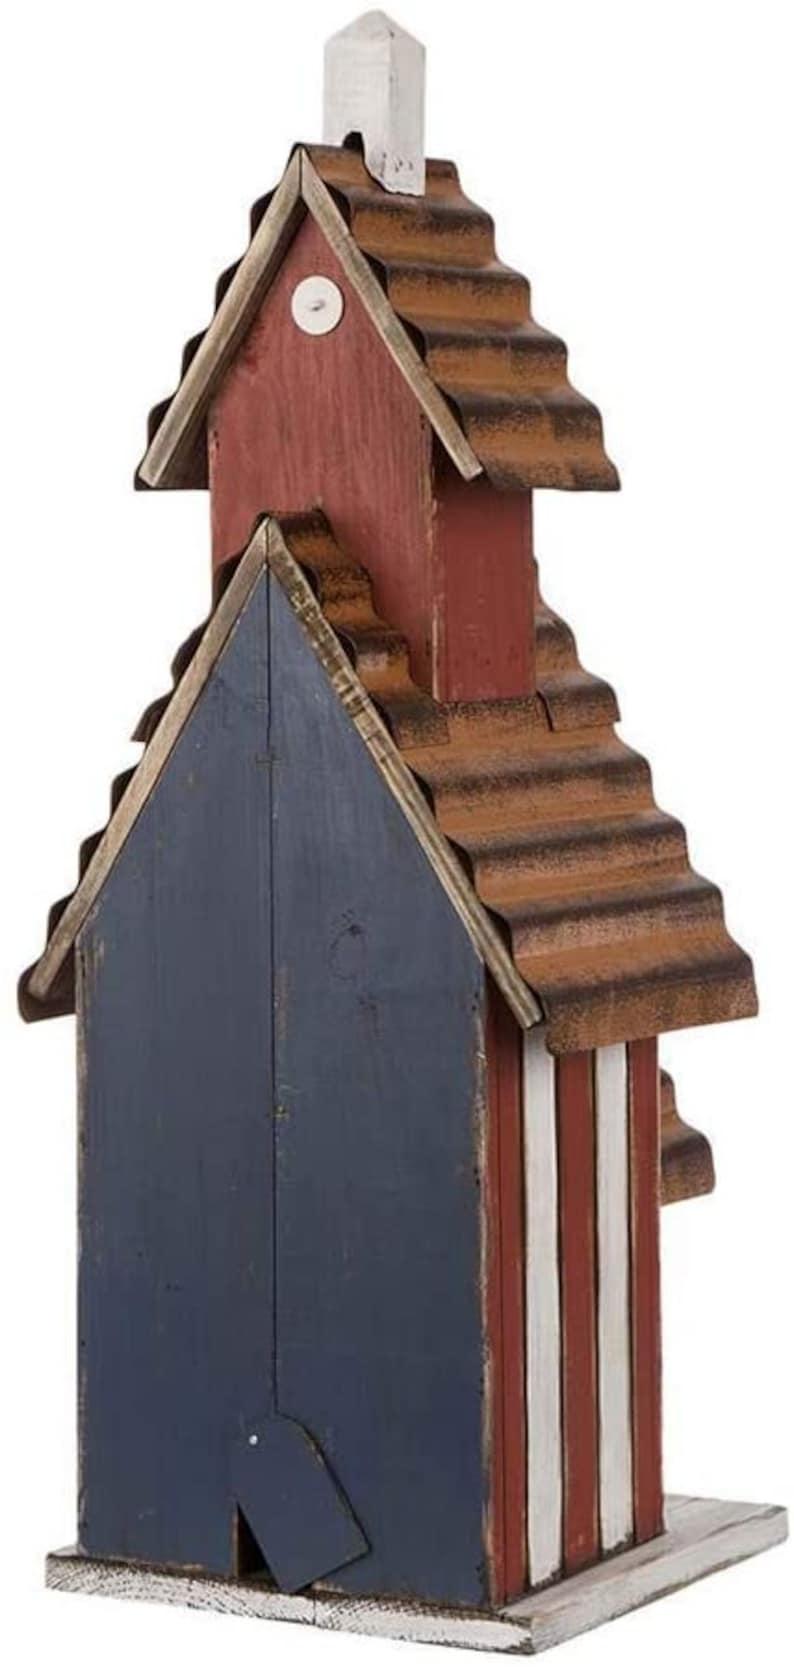 Natural Handmade  Oversized Rustic Wooden Metal Patriotic Birdhouse Distressed Garden Bird House 24.41 H for Garden Lawn Home Decorations